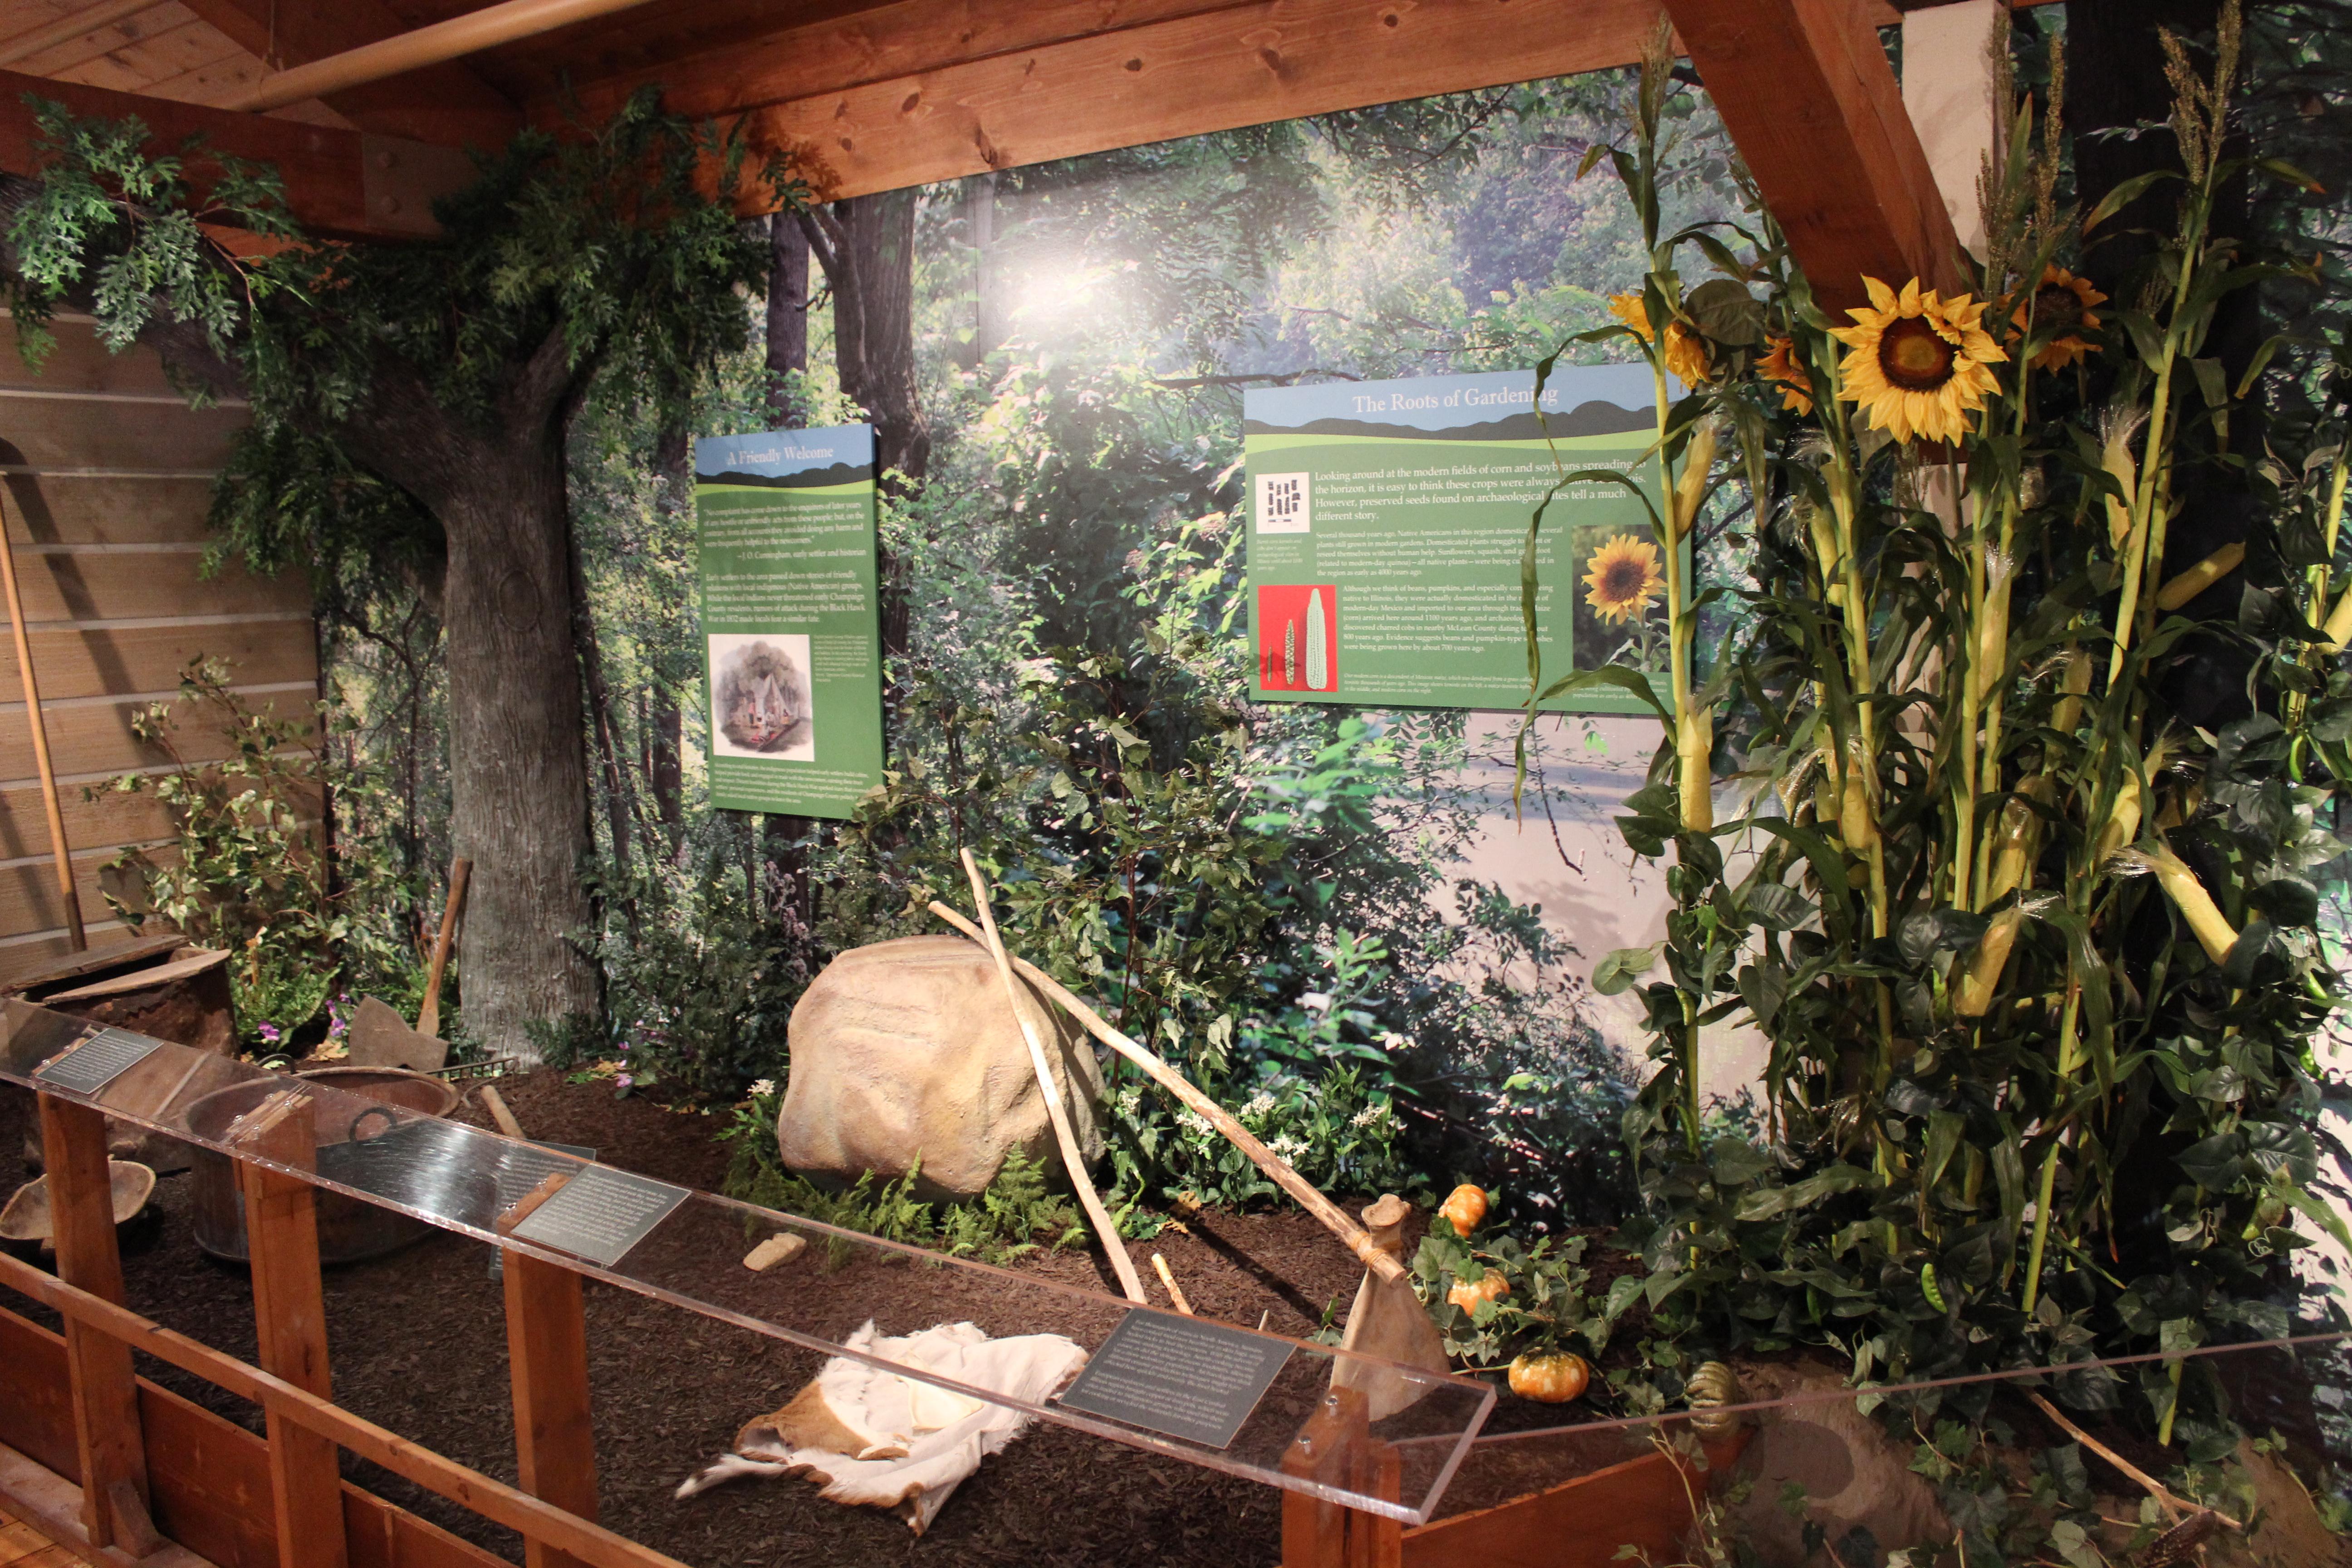 The Grand Prairie Story